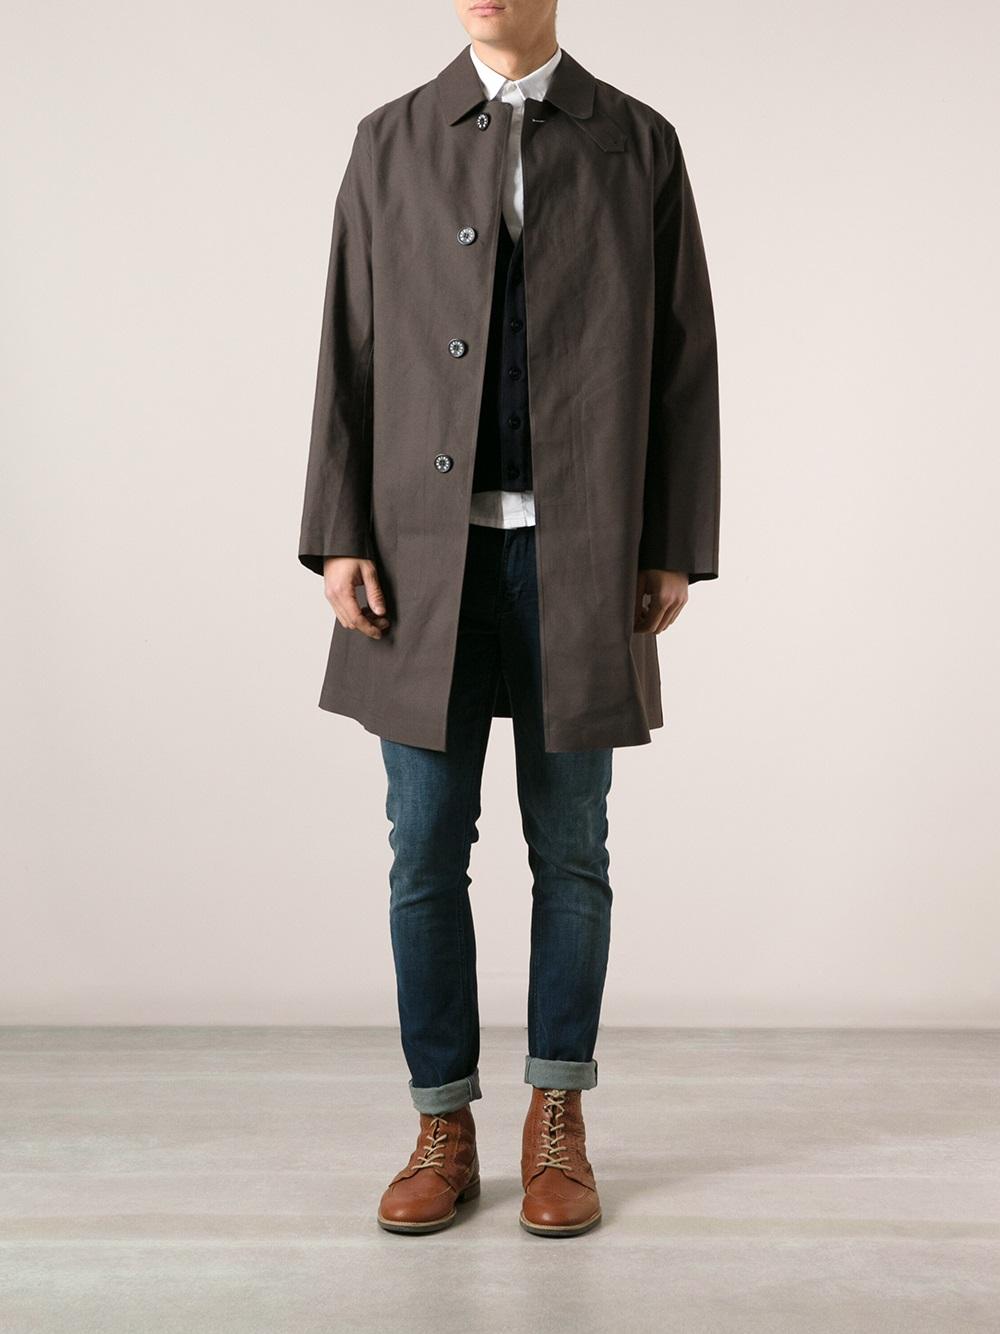 Mackintosh Dunkeld Trenchcoat In Brown For Men Lyst